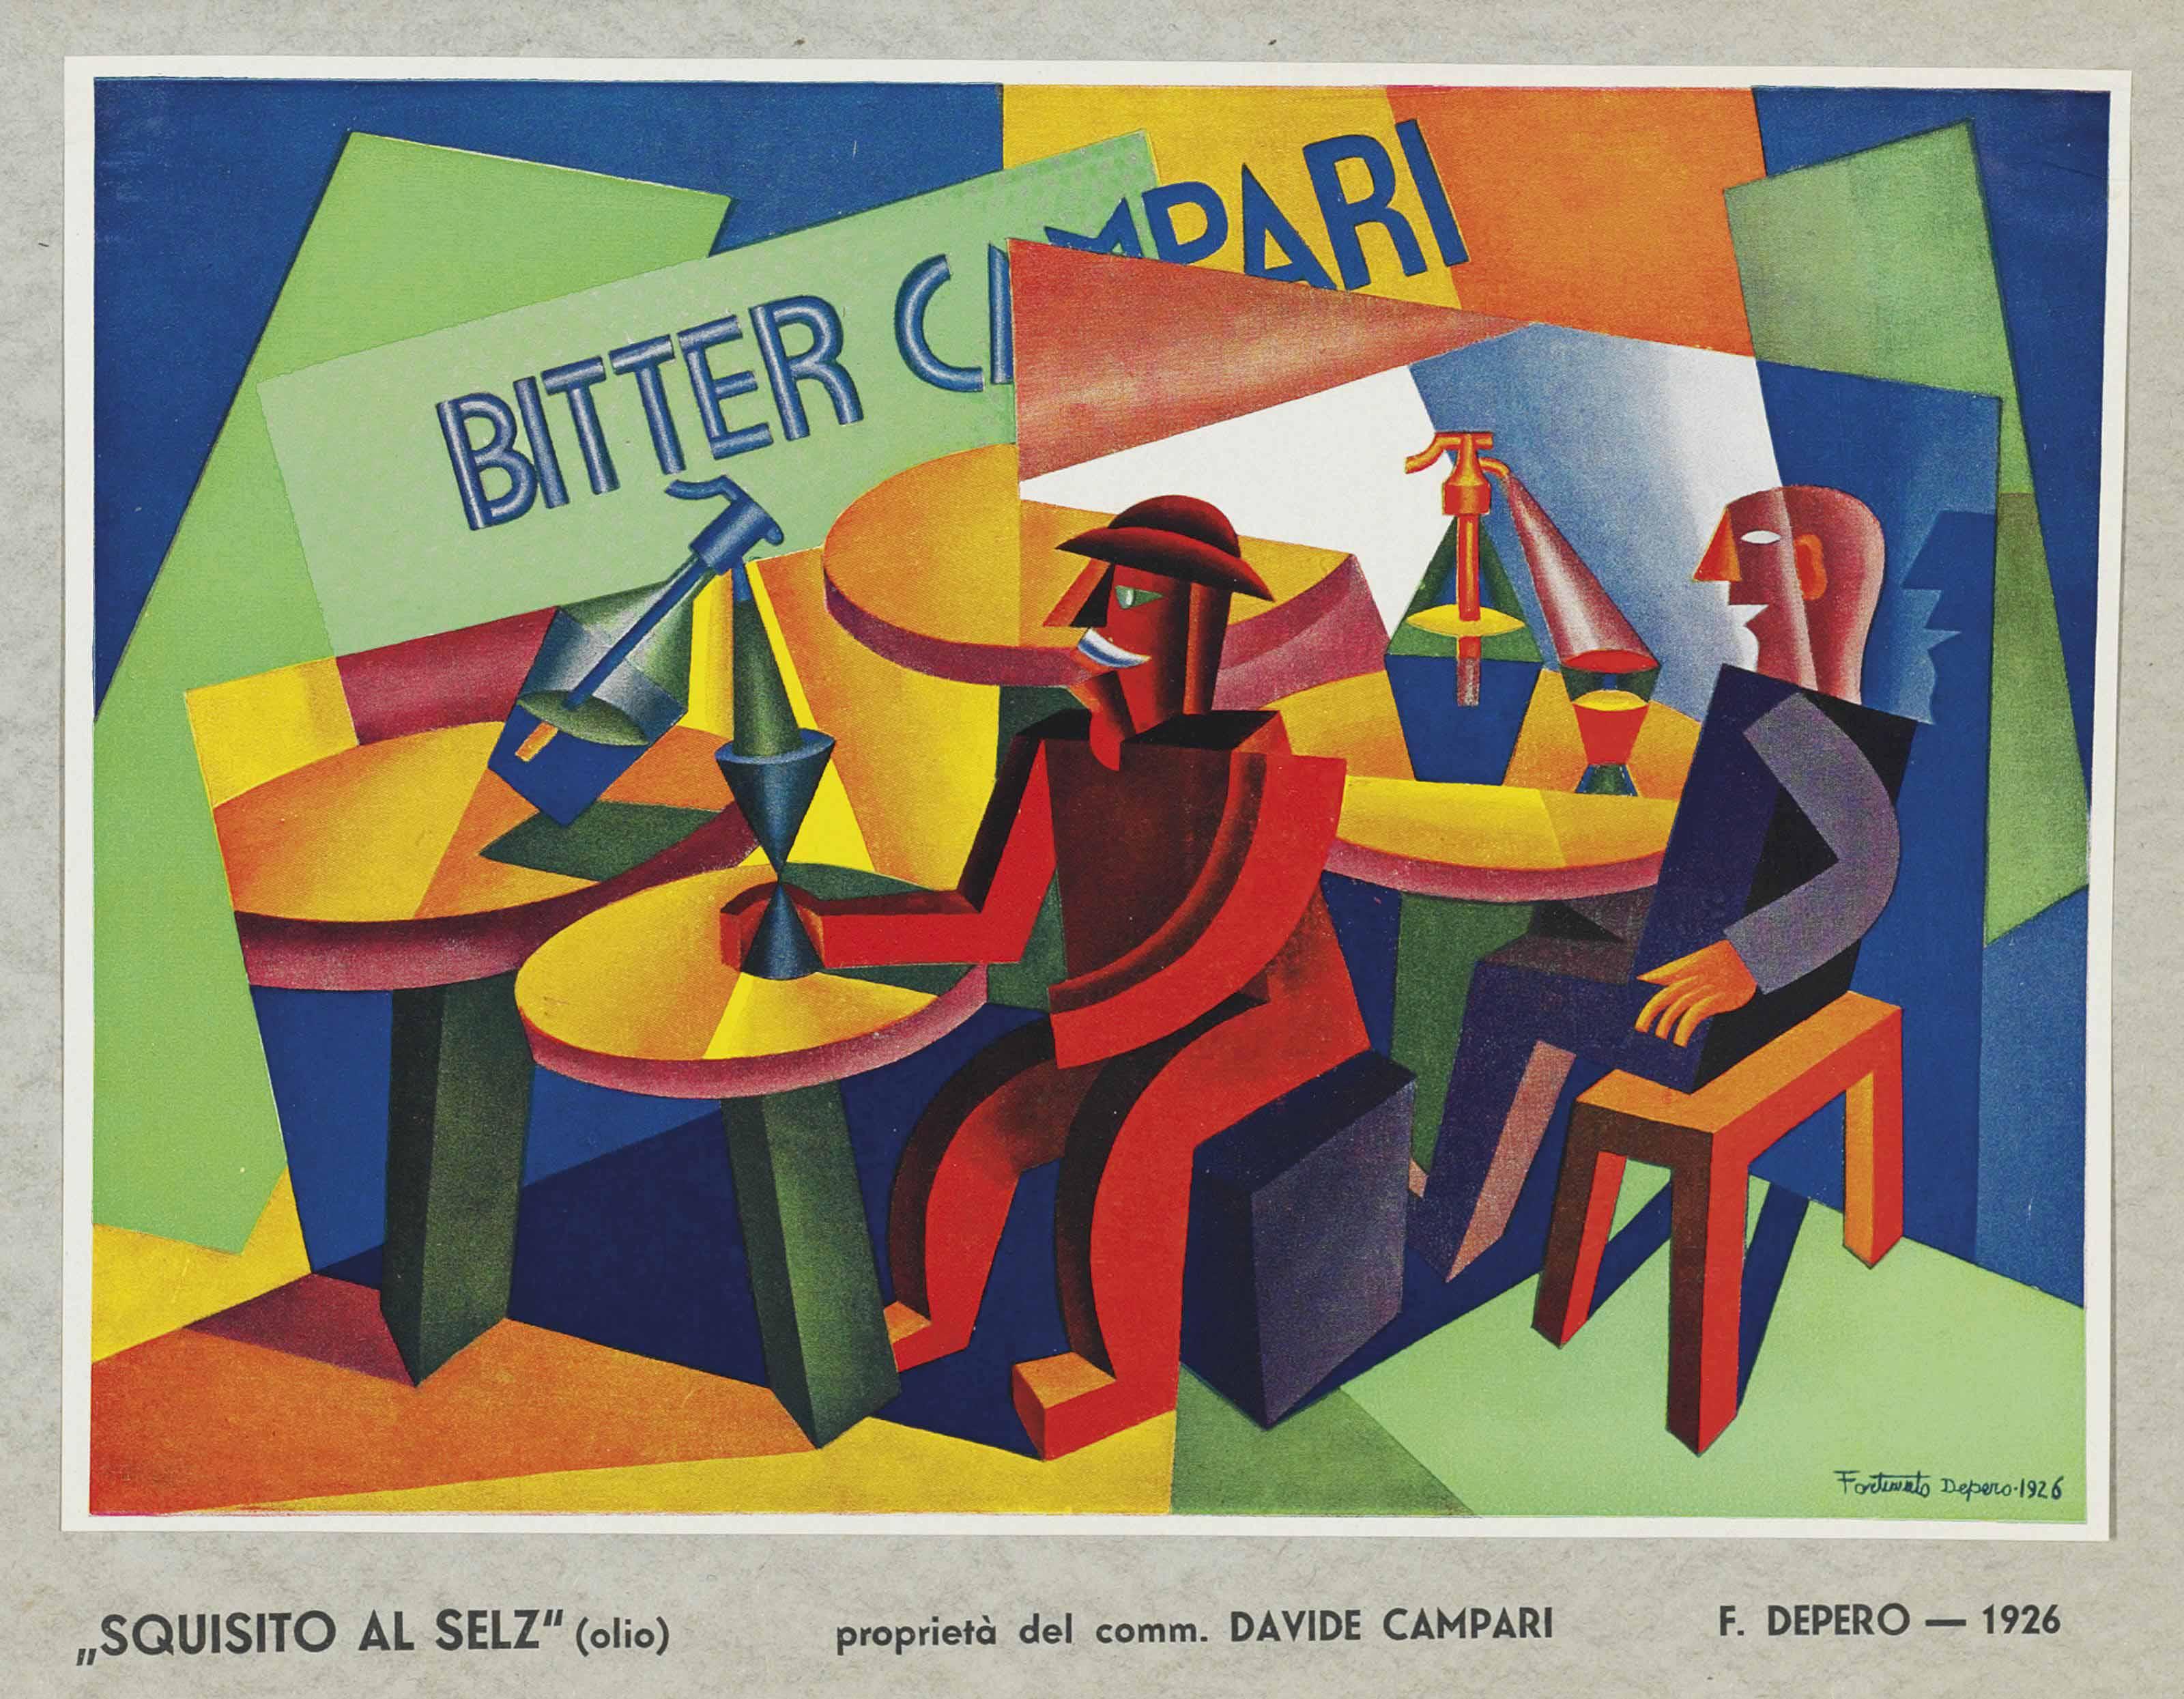 MARINETTI -- DEPERO, Fortunato (1892-1960). Saggio futurista 1932. In occasione della venuta nel trentino di S.E. Marinetti. [Also known as Futurismo 1932.] Rovereto: Mercurio, 1932. 2° (344 x 246mm). Halftone portrait frontispiece, two colour plates of which one mounted as issued, 8 monochrome plates, illustrations. (Corners bumped.) Original salmon-pink wrappers printed in gold and black (front cover unevenly faded, tears along the spine and at spine ends, corners bumped).